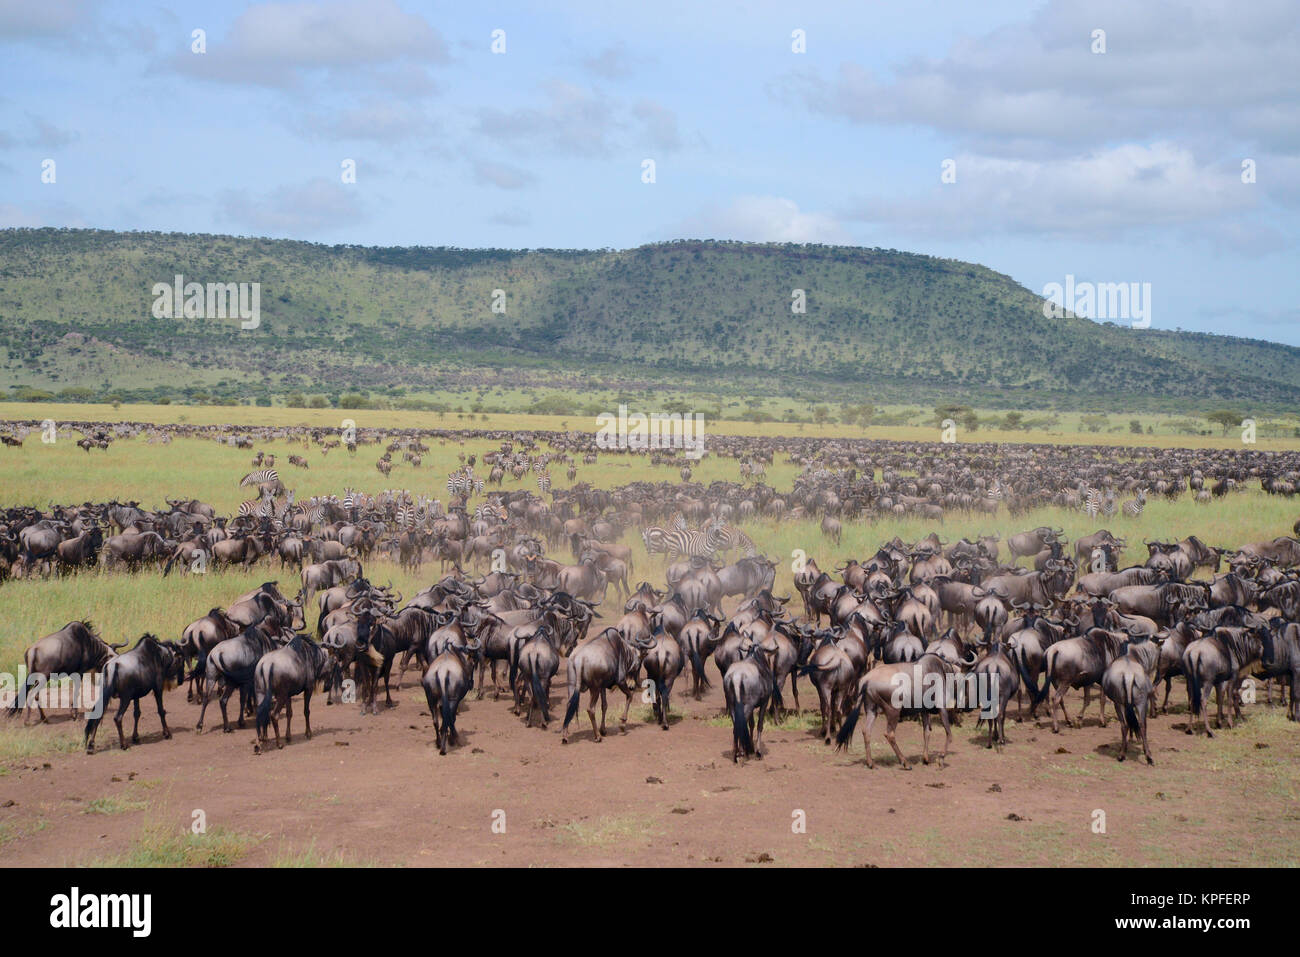 Wildlife sightseeing in one of the prime wildlife destinations on earht -- Serengeti, Tanzania. Migrating wildebeest. - Stock Image